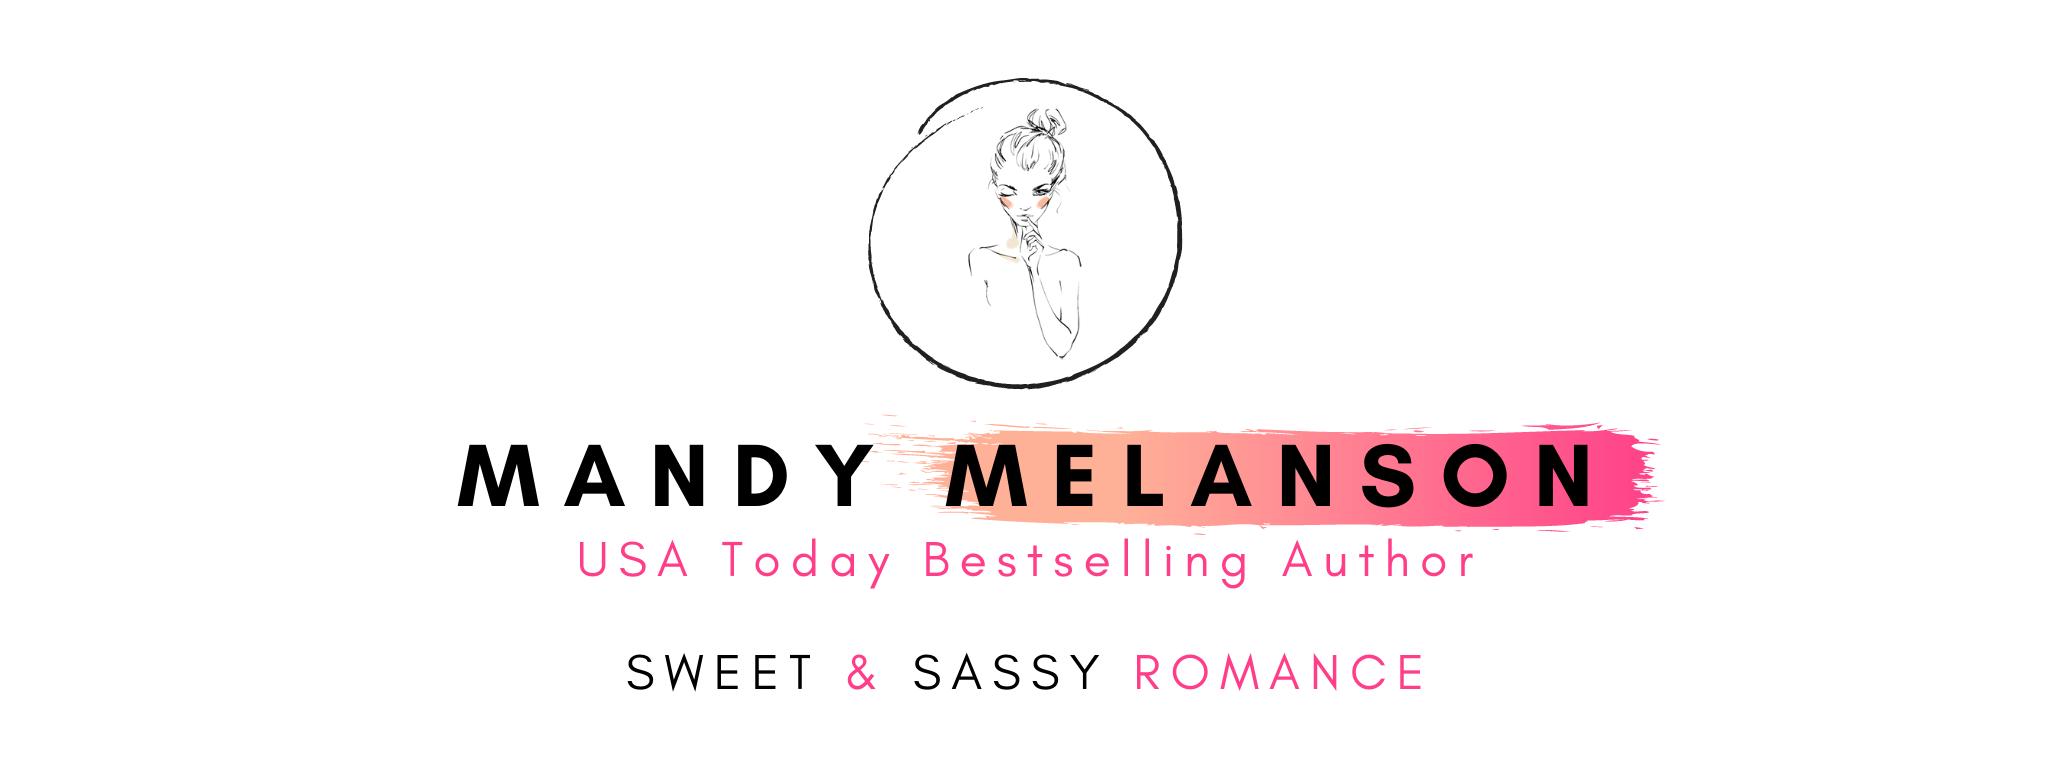 Mandy Melanson | 3x USA Today Bestselling Romance Author